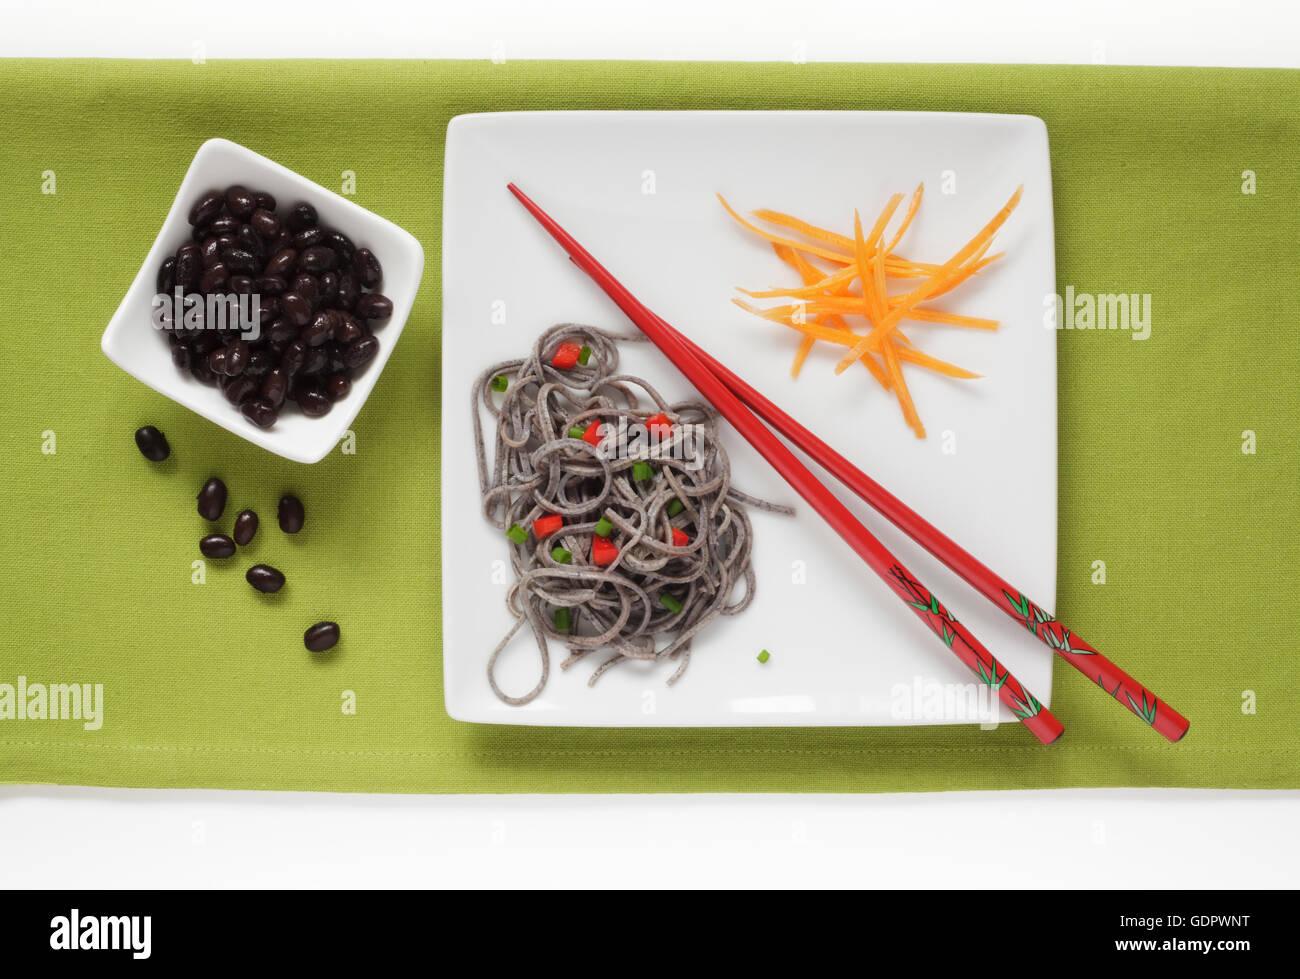 Le haricot noir et le haricot noir garni de carottes Spaghetti Photo Stock